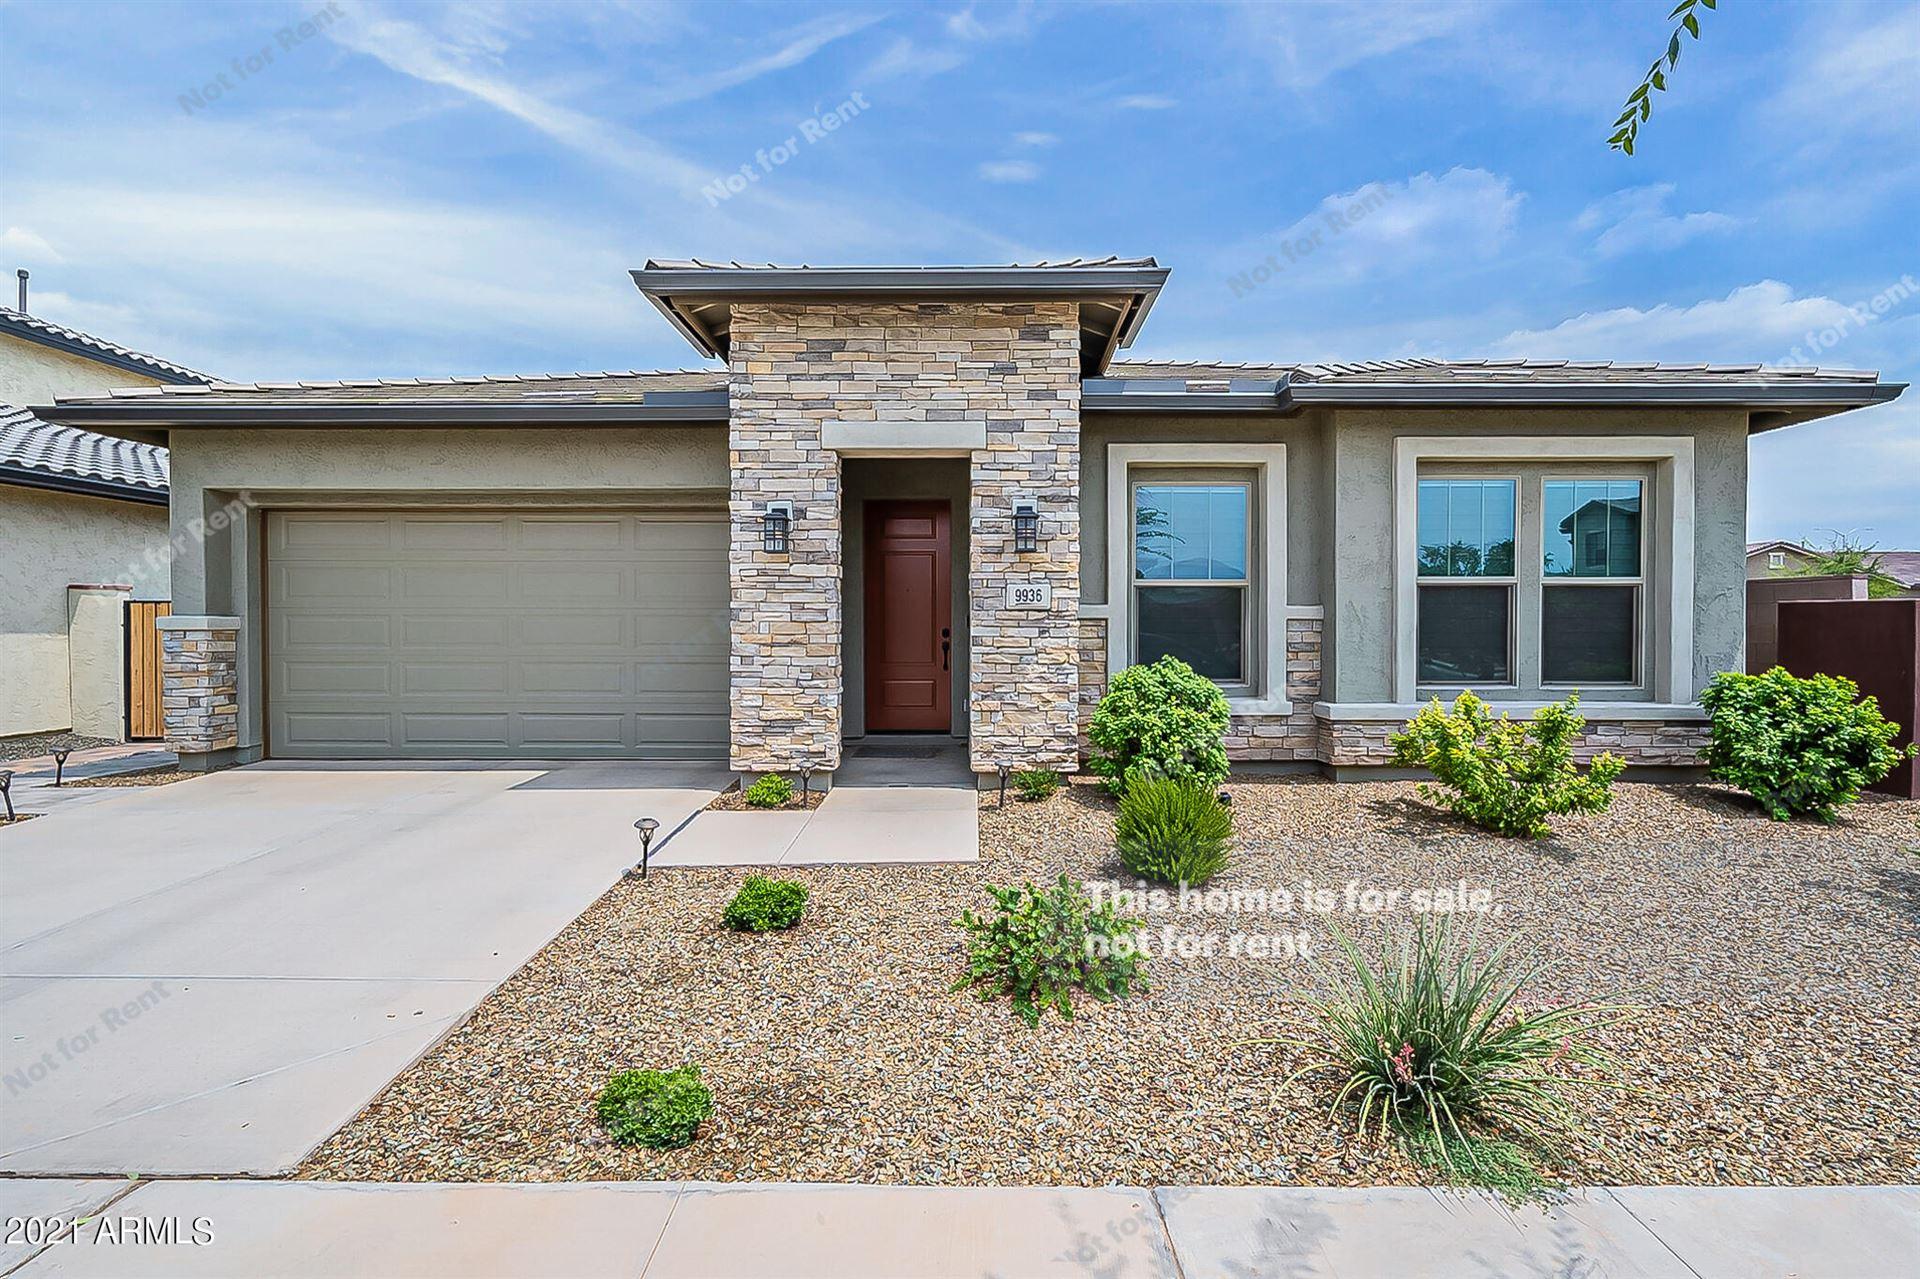 Photo of 9936 E TRIPOLI Avenue, Mesa, AZ 85212 (MLS # 6269321)